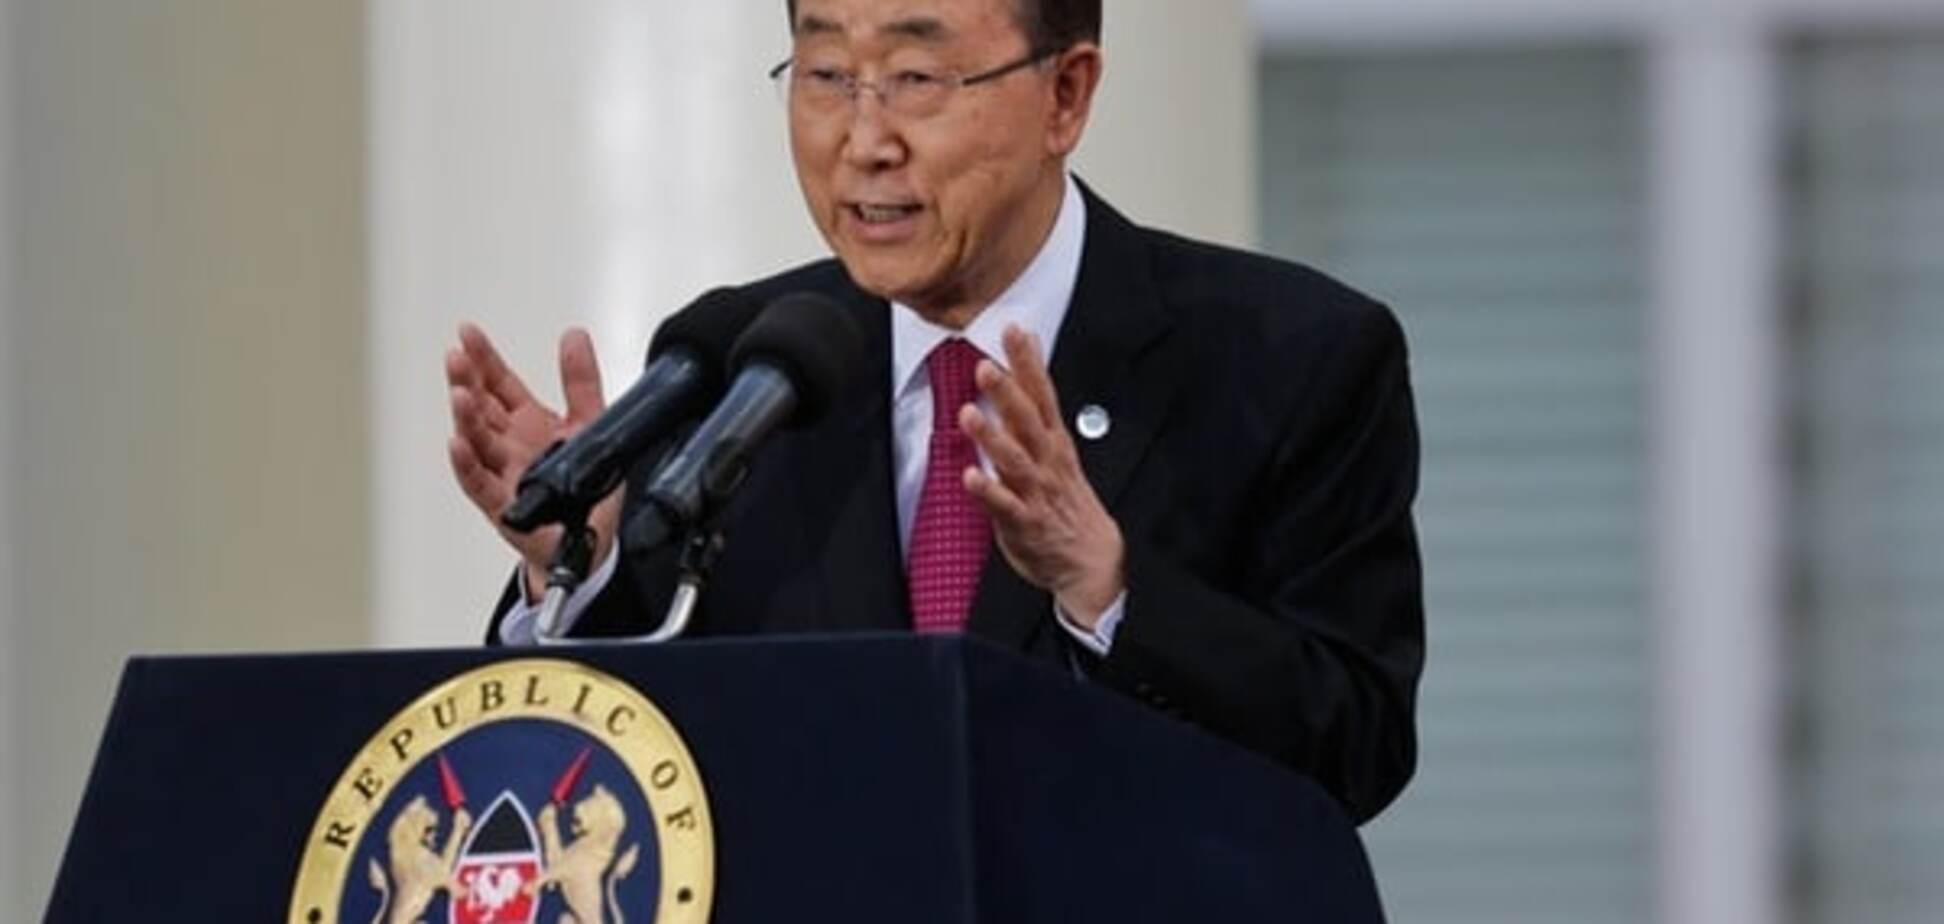 Олимпиада 2016, ООН, Пан Ги Мун